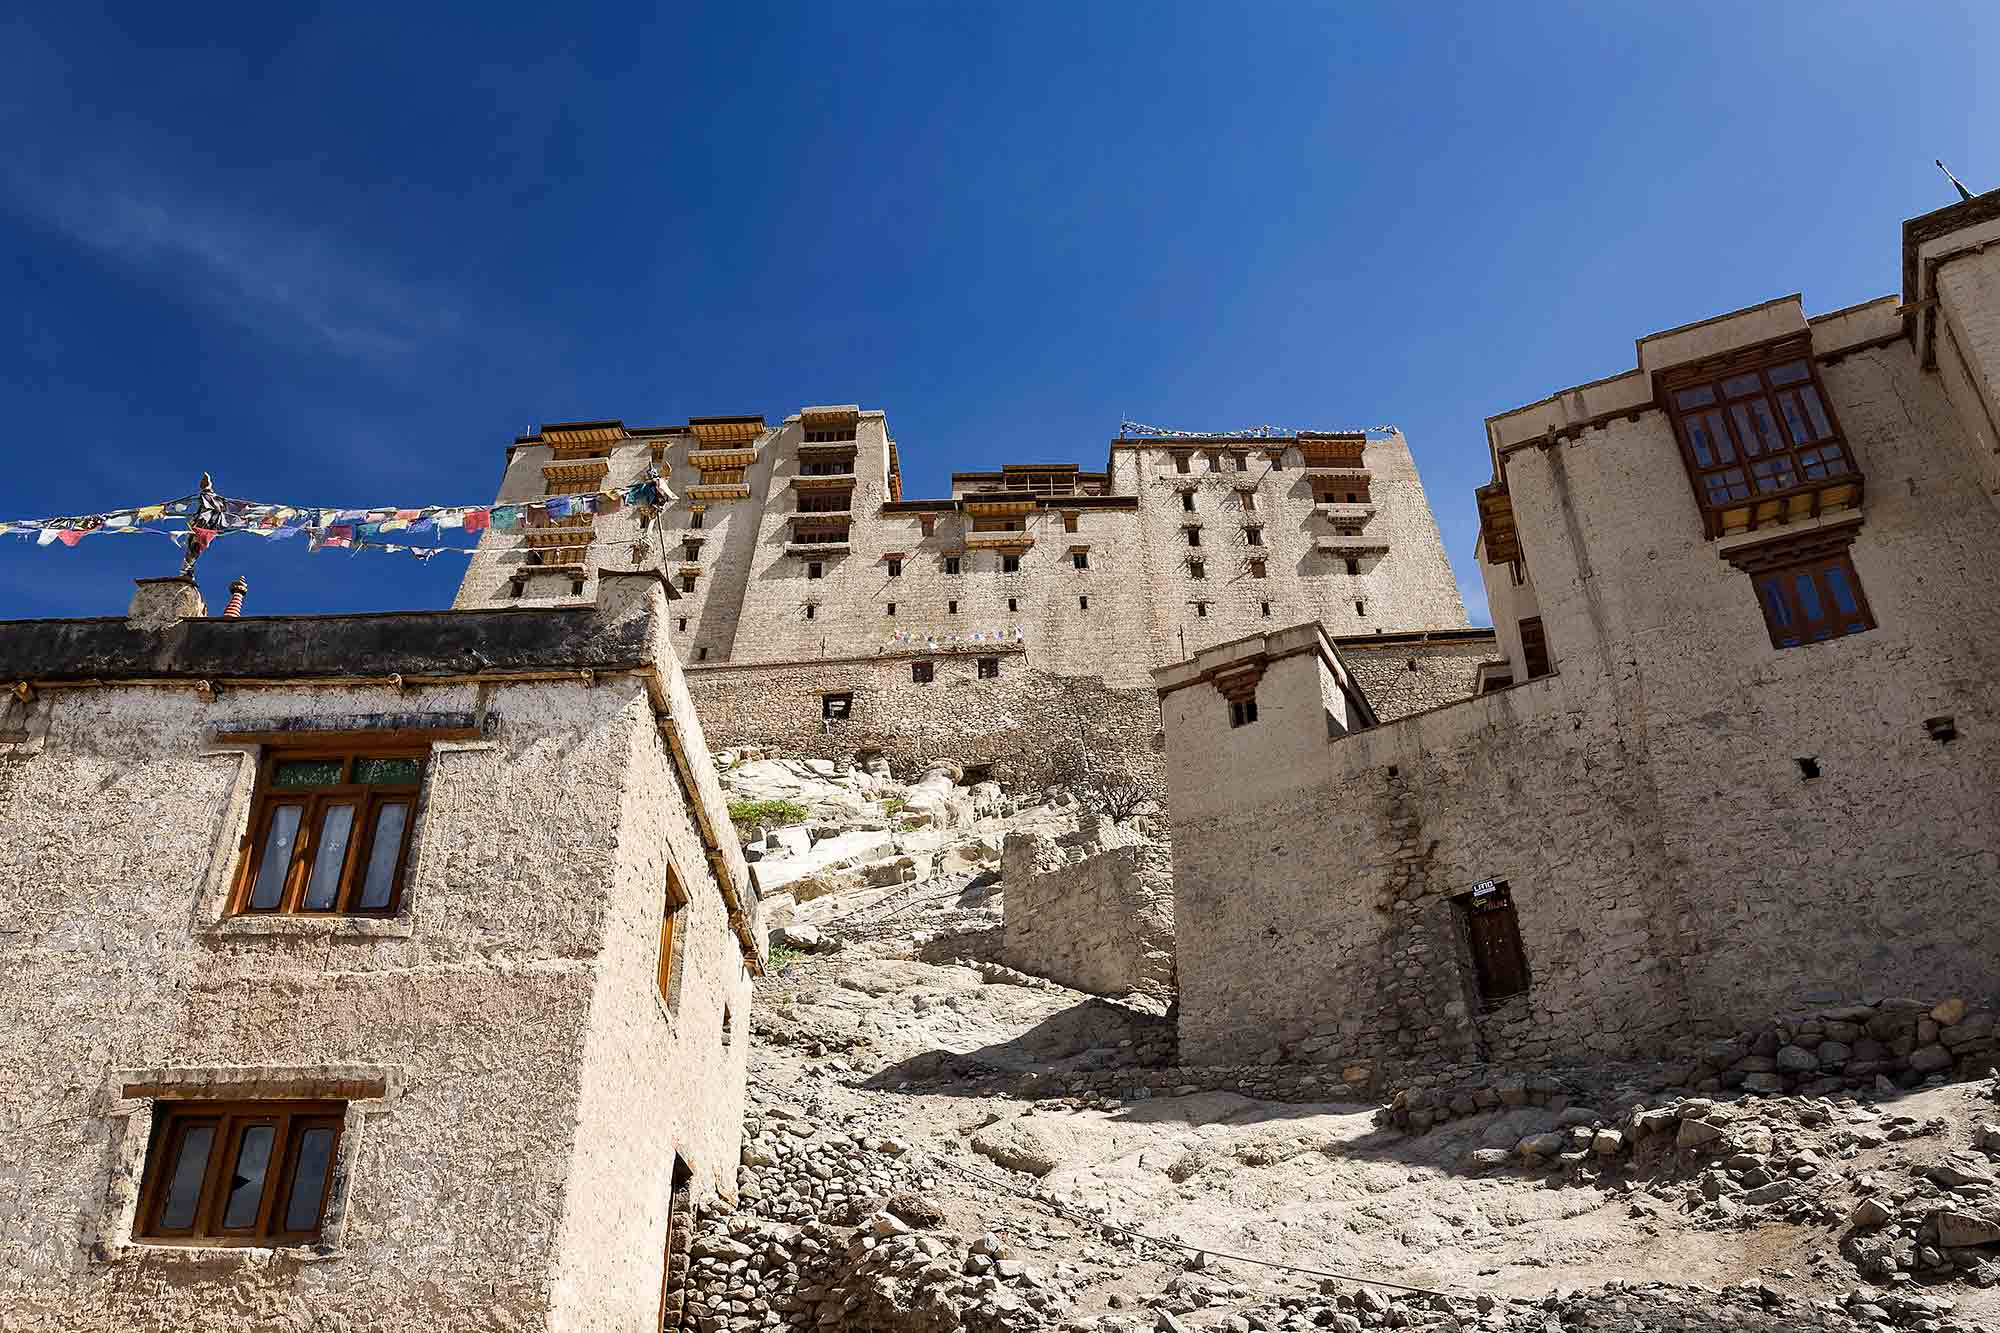 leh-palace-ladakh-kashmir-india-1